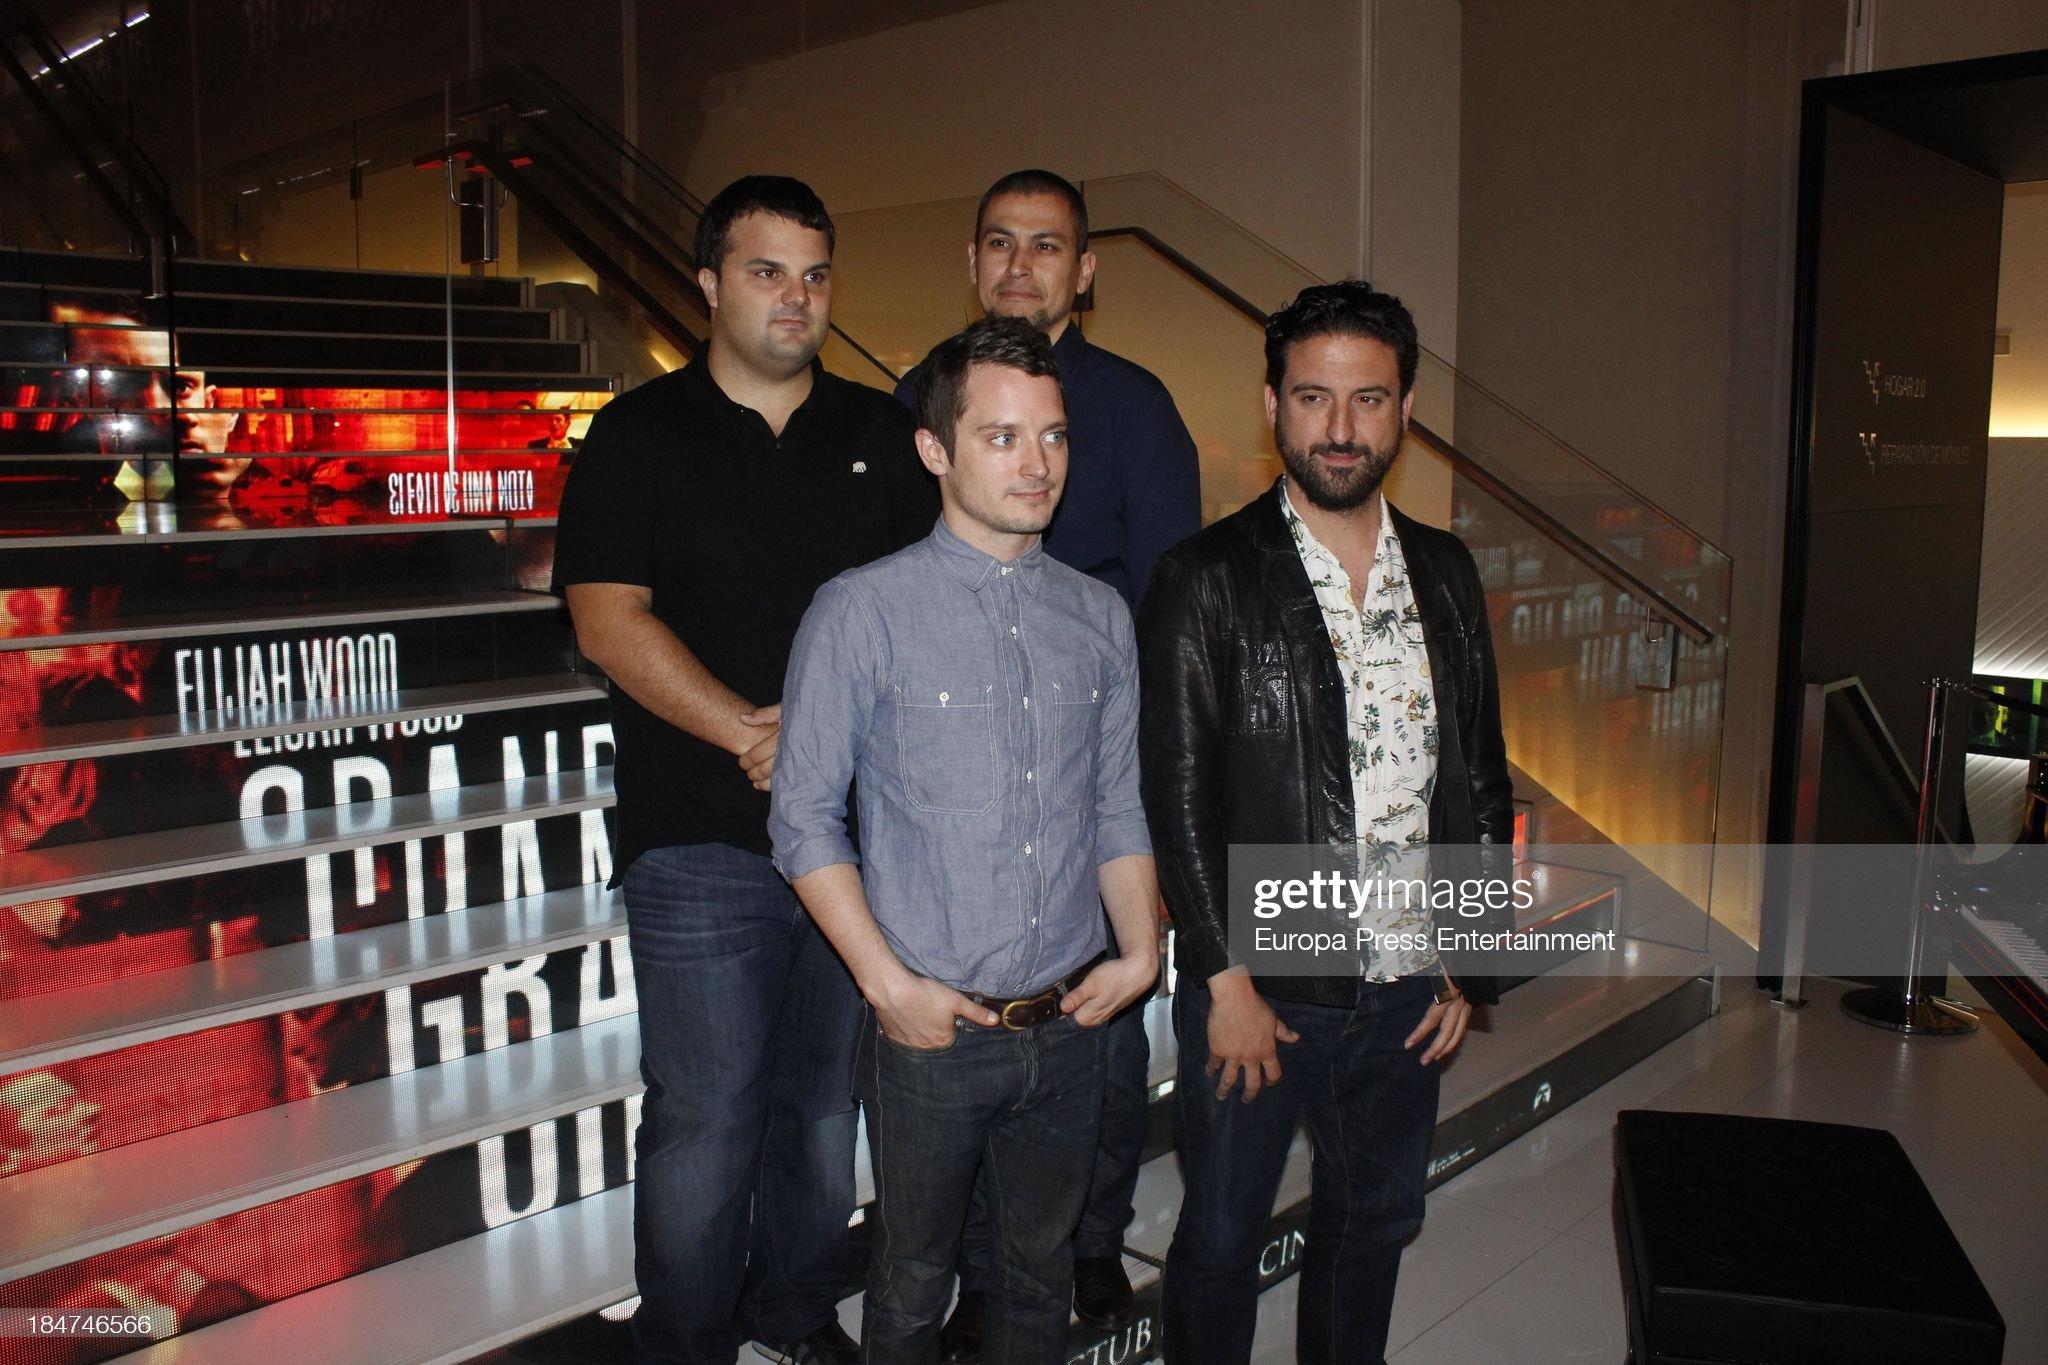 ¿Cuánto mide Eugenio Mira? - Altura Producer-adrian-guerra-actor-elijah-wood-producer-rodrigo-cortes-and-picture-id184746566?s=2048x2048